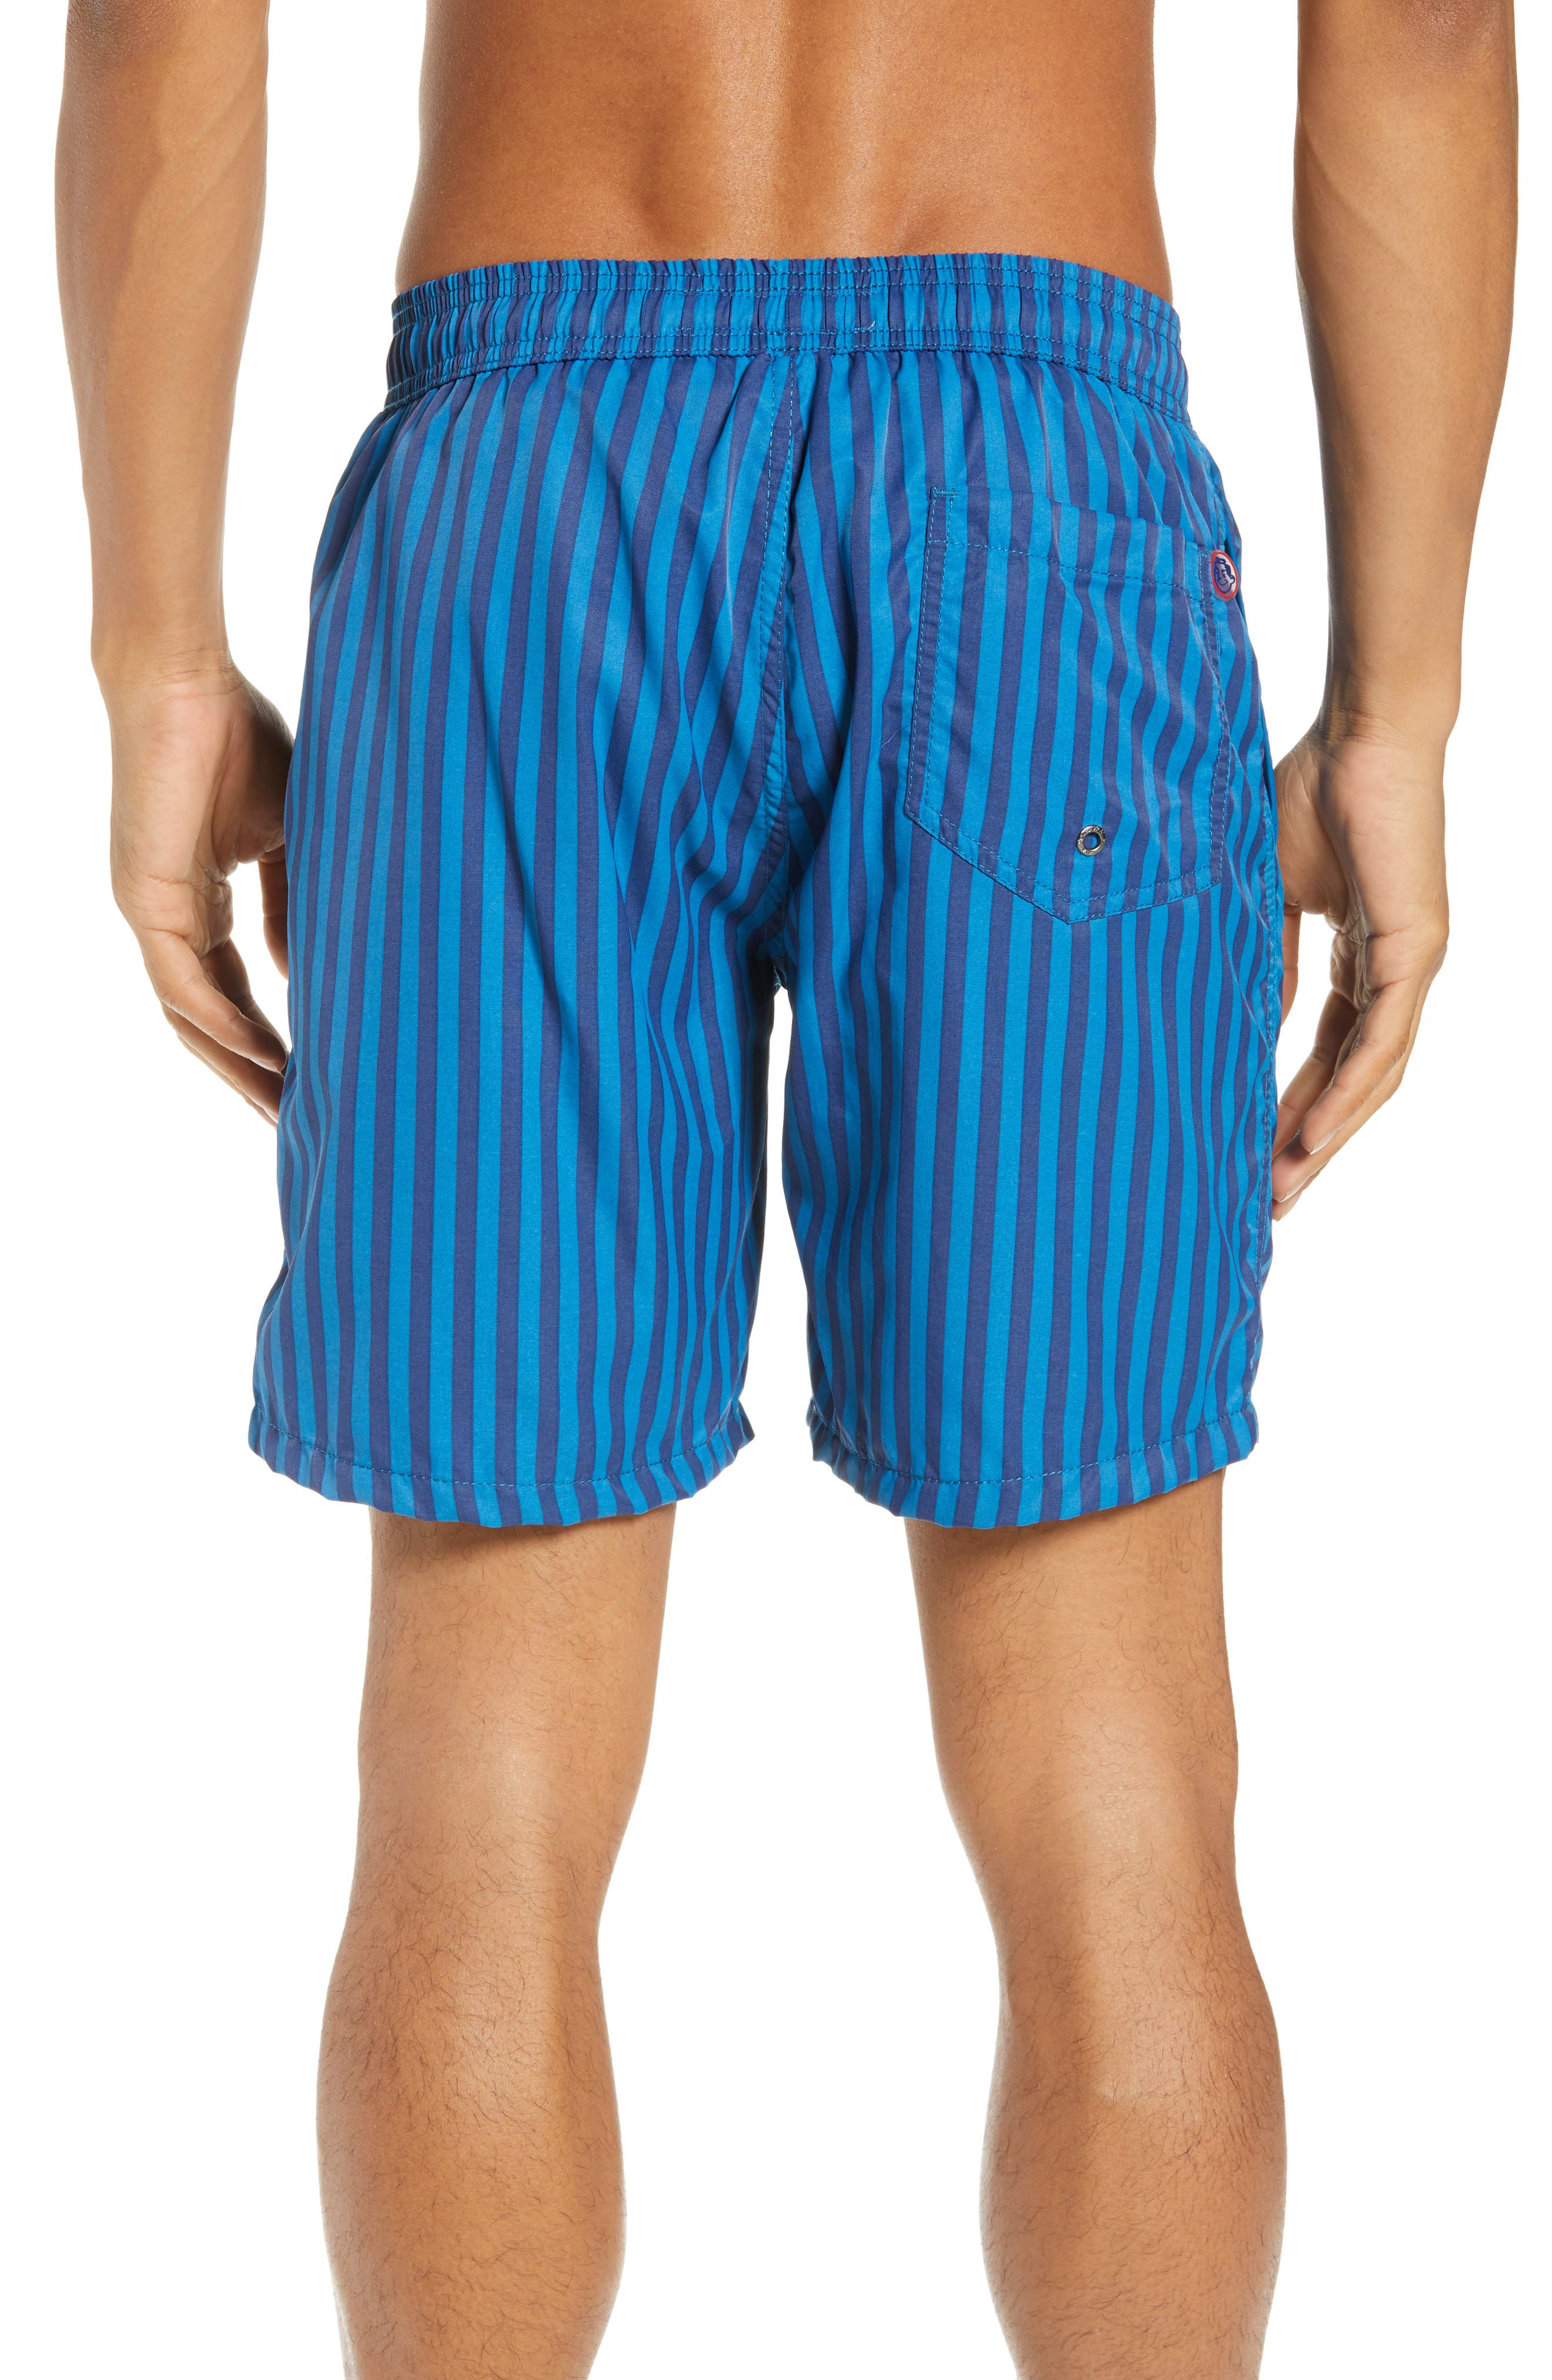 Mr. Swim Cabana Stripe Swim Trunks,                             Alternate thumbnail 2, color,                             NAVY/ ROYAL